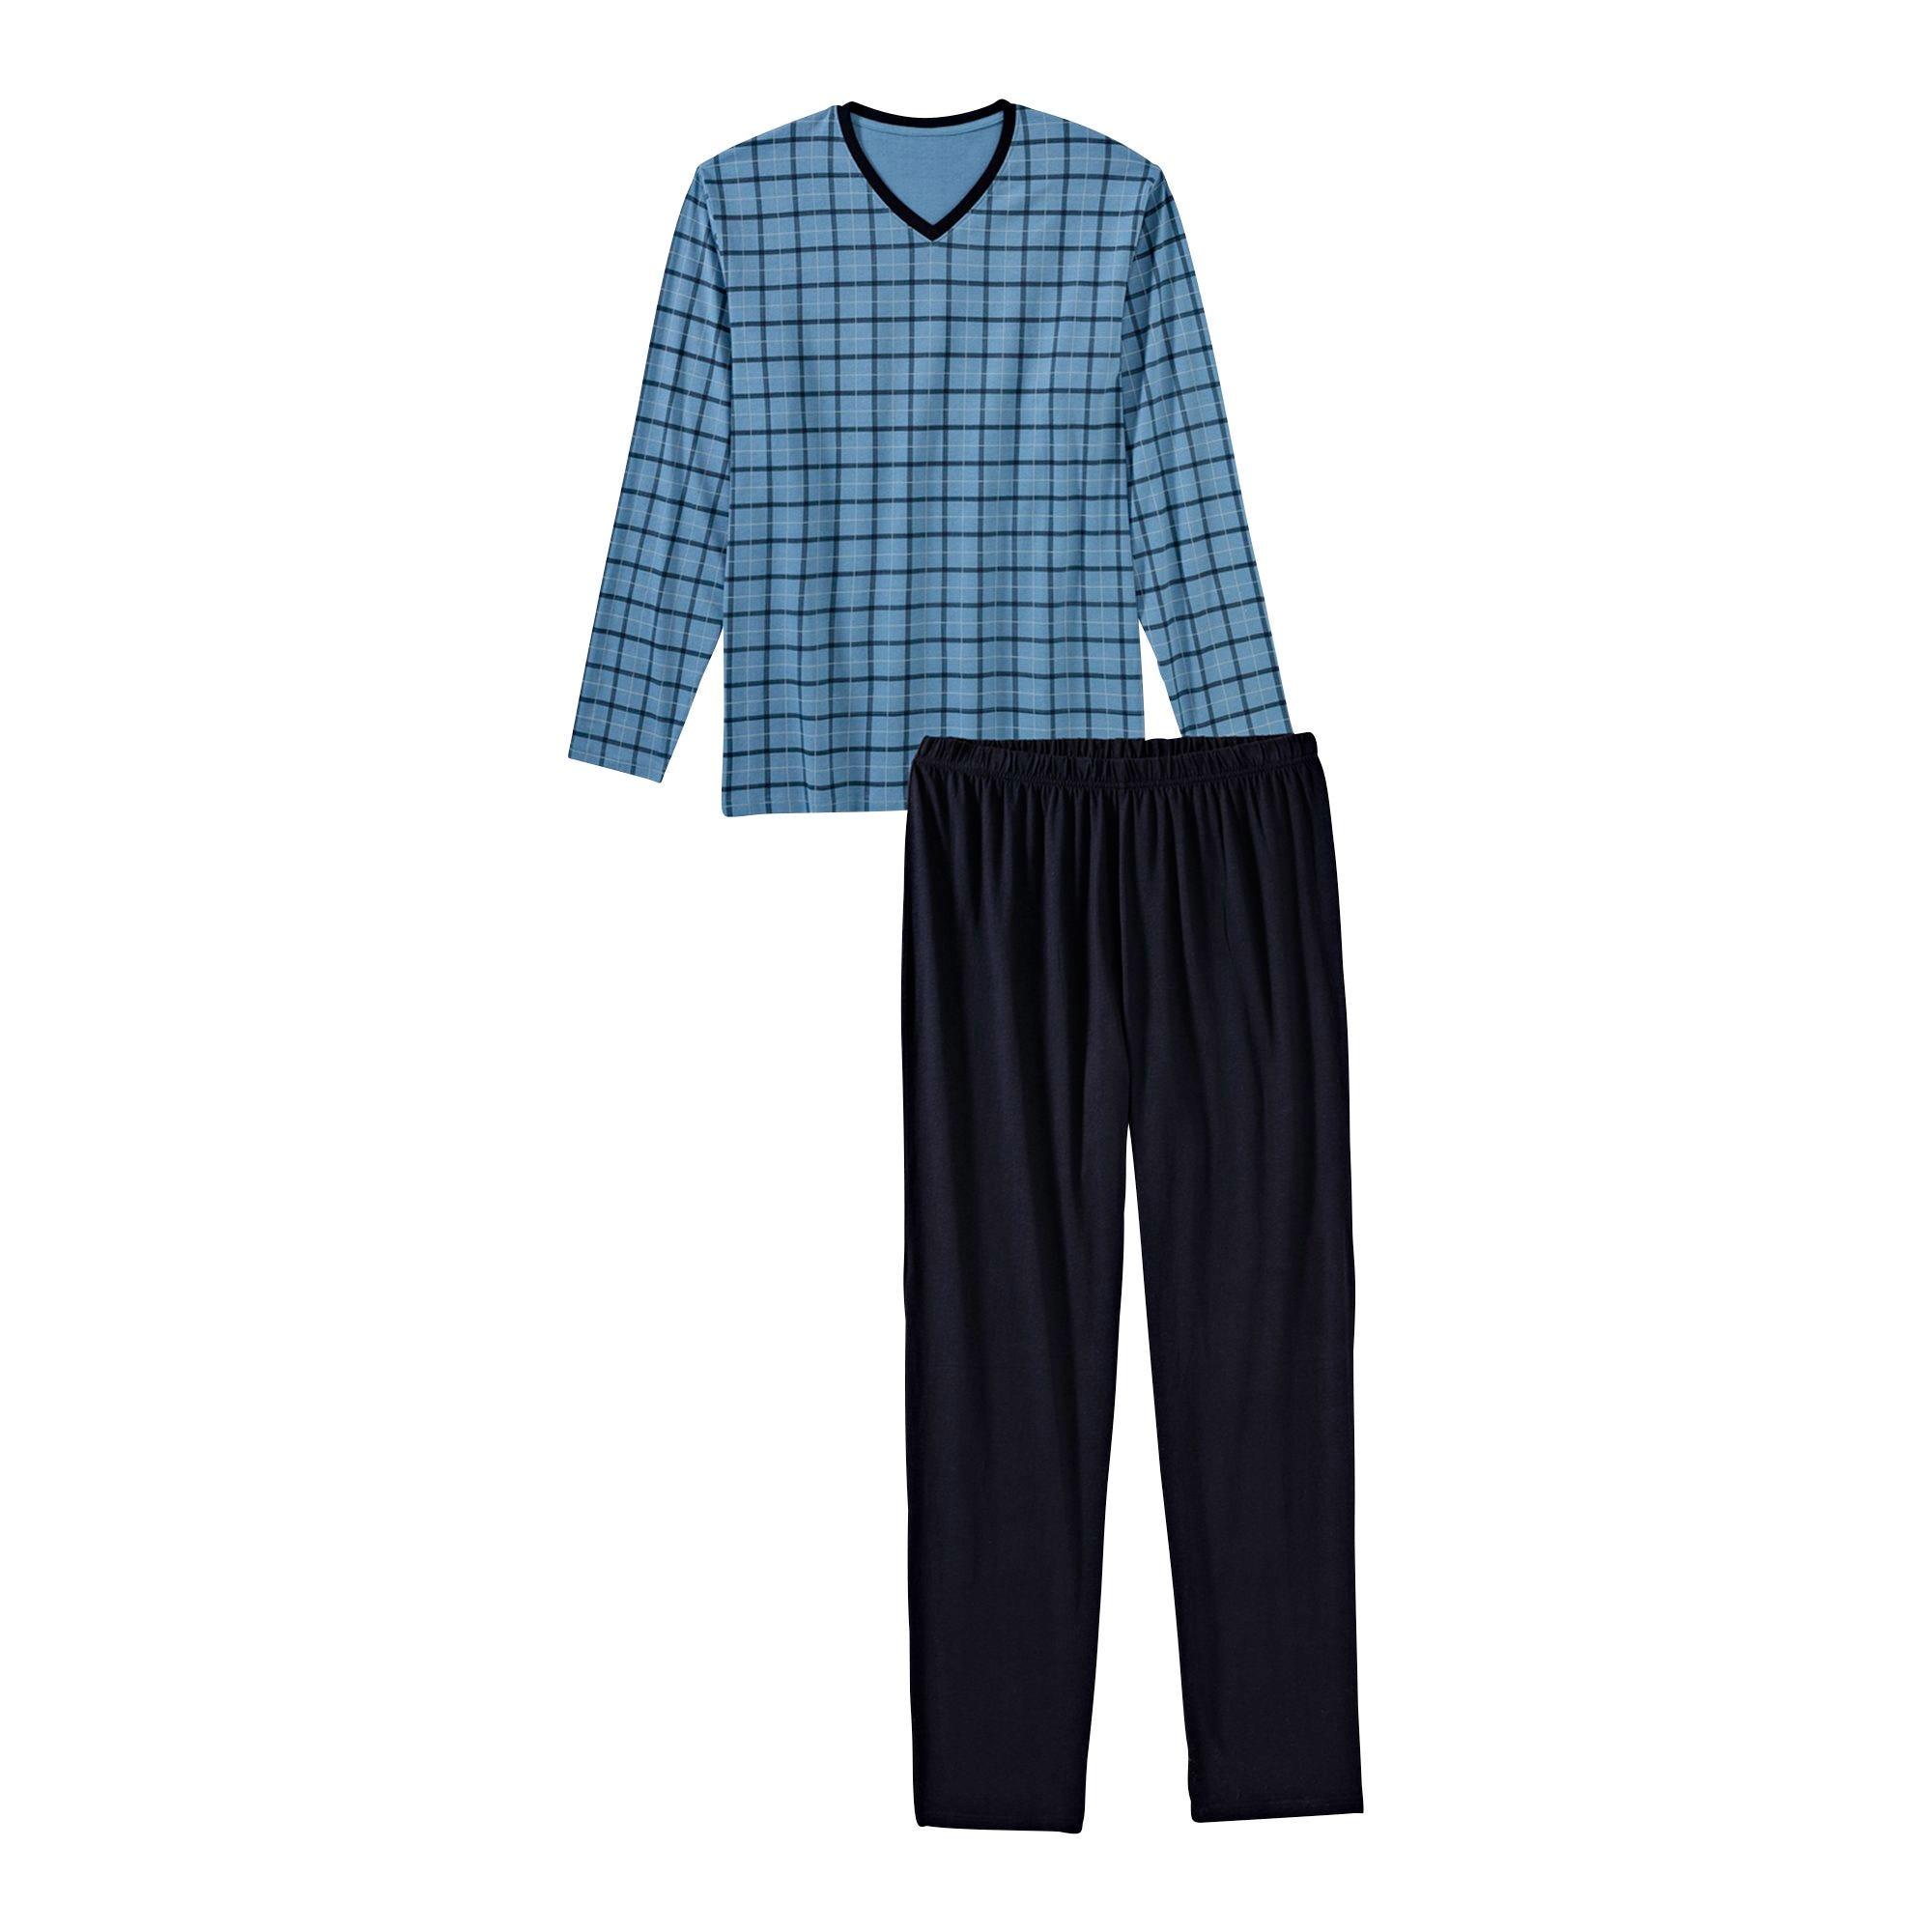 Herren Pyjama, kurz, blaugrau, 52